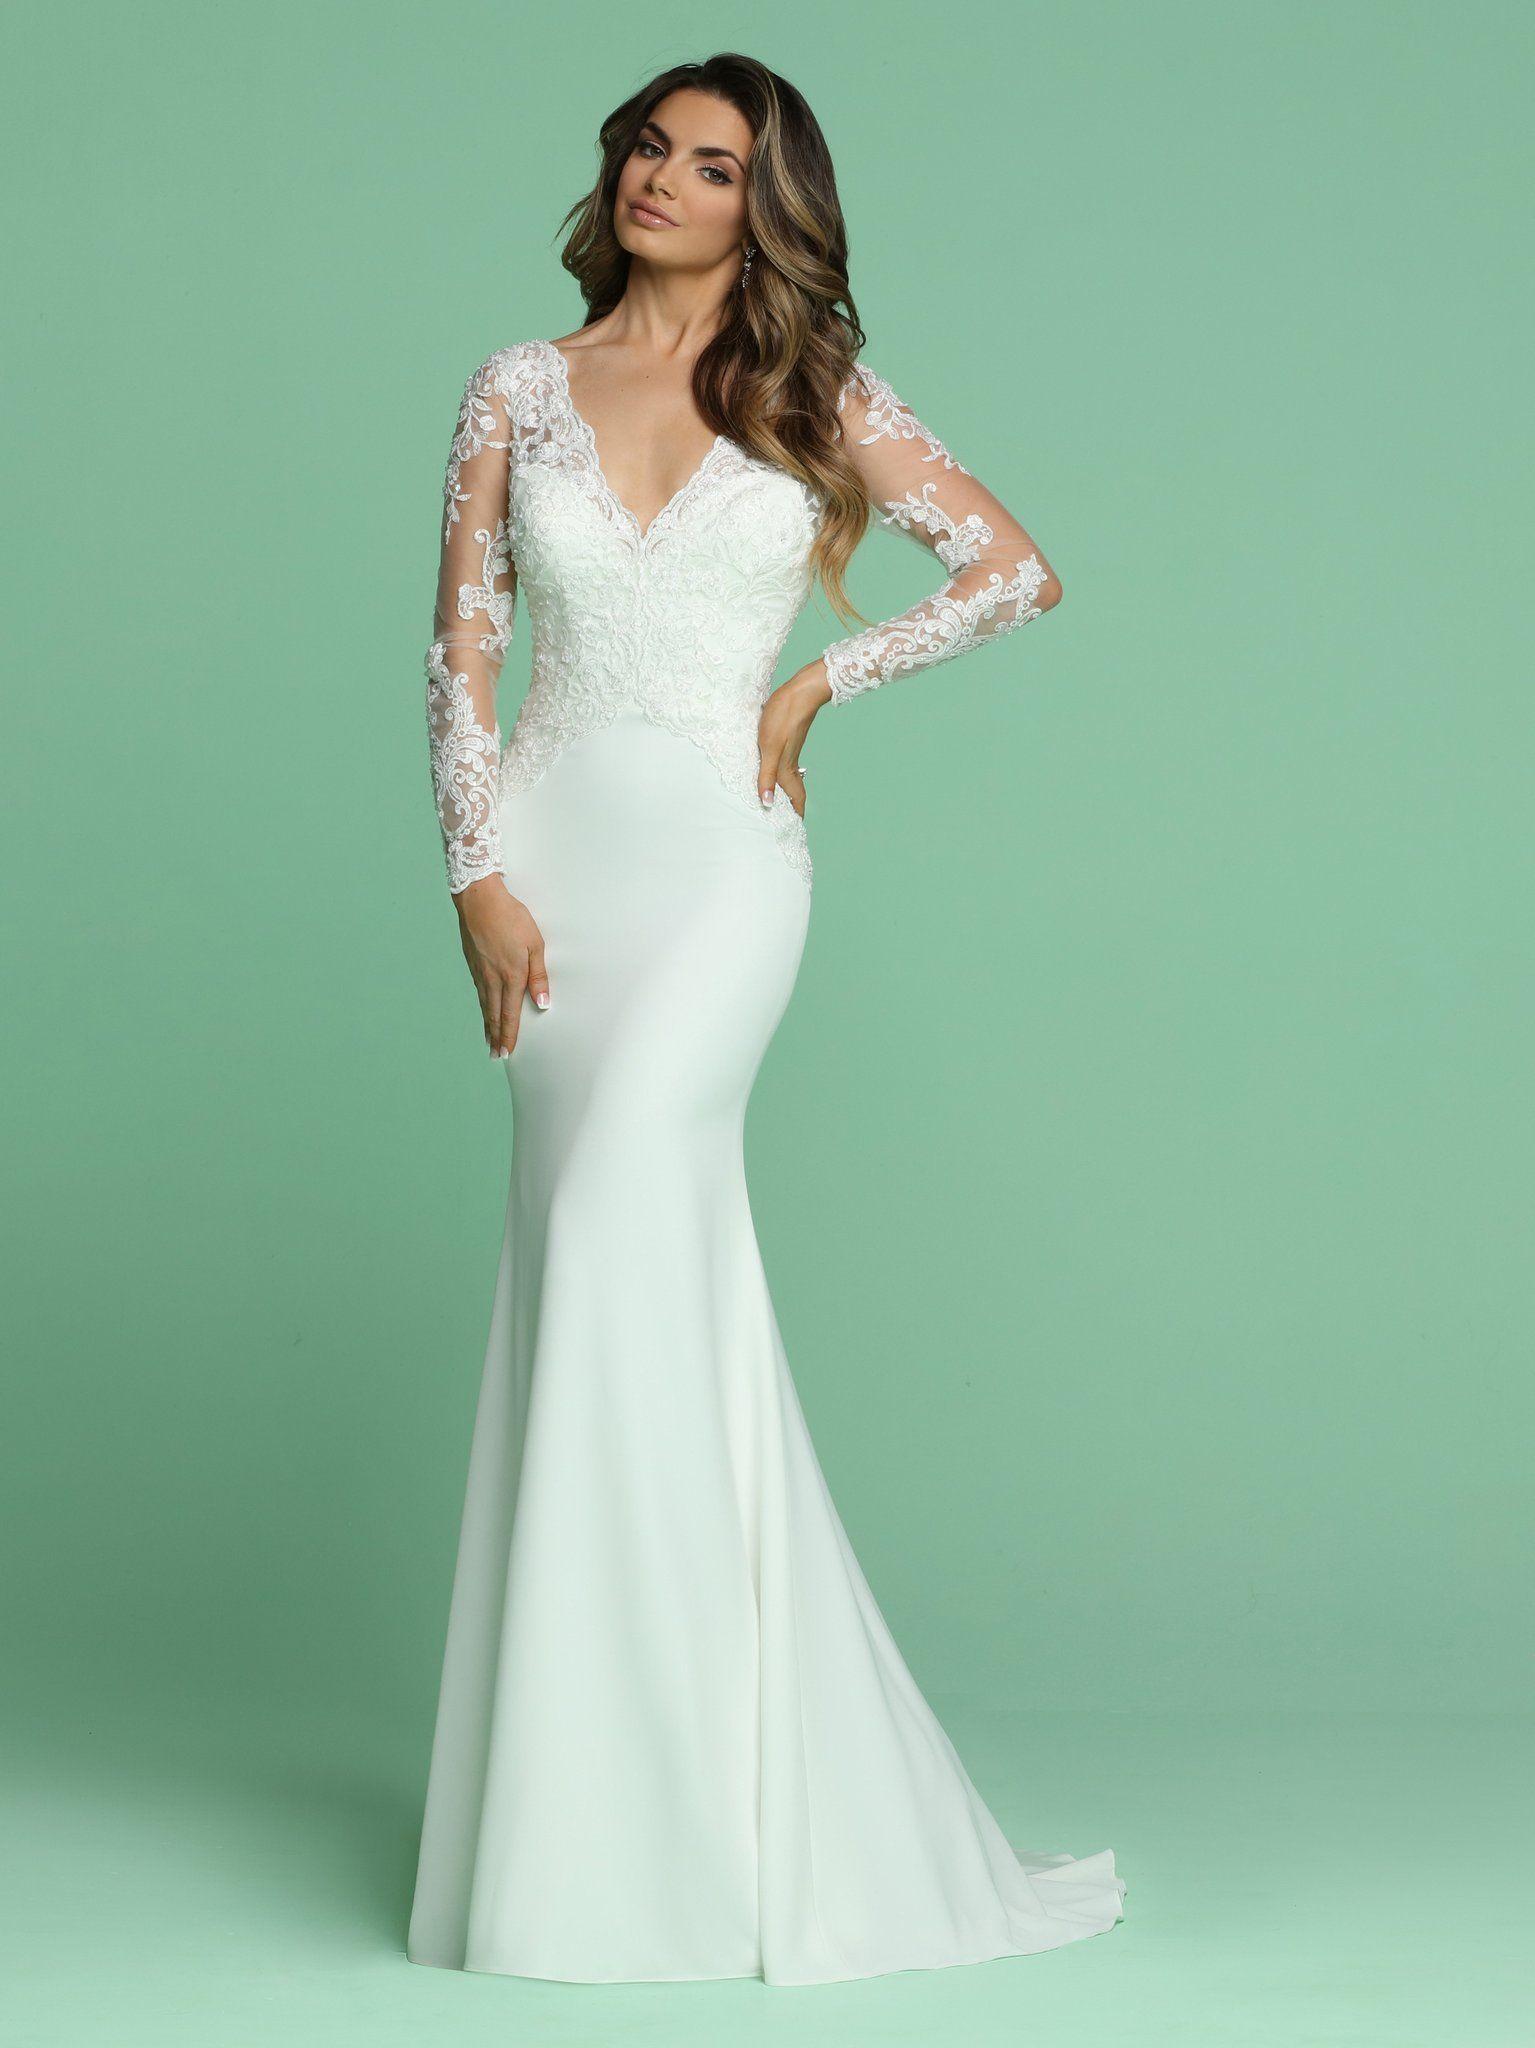 Davinci Bridal 50610 Long Sleeve Sheer Lace Fitted Wedding Dress V Neck Gown Long Sleeve Wedding Dress Lace Fitted Wedding Dress Form Fitting Wedding Dress [ 2048 x 1535 Pixel ]